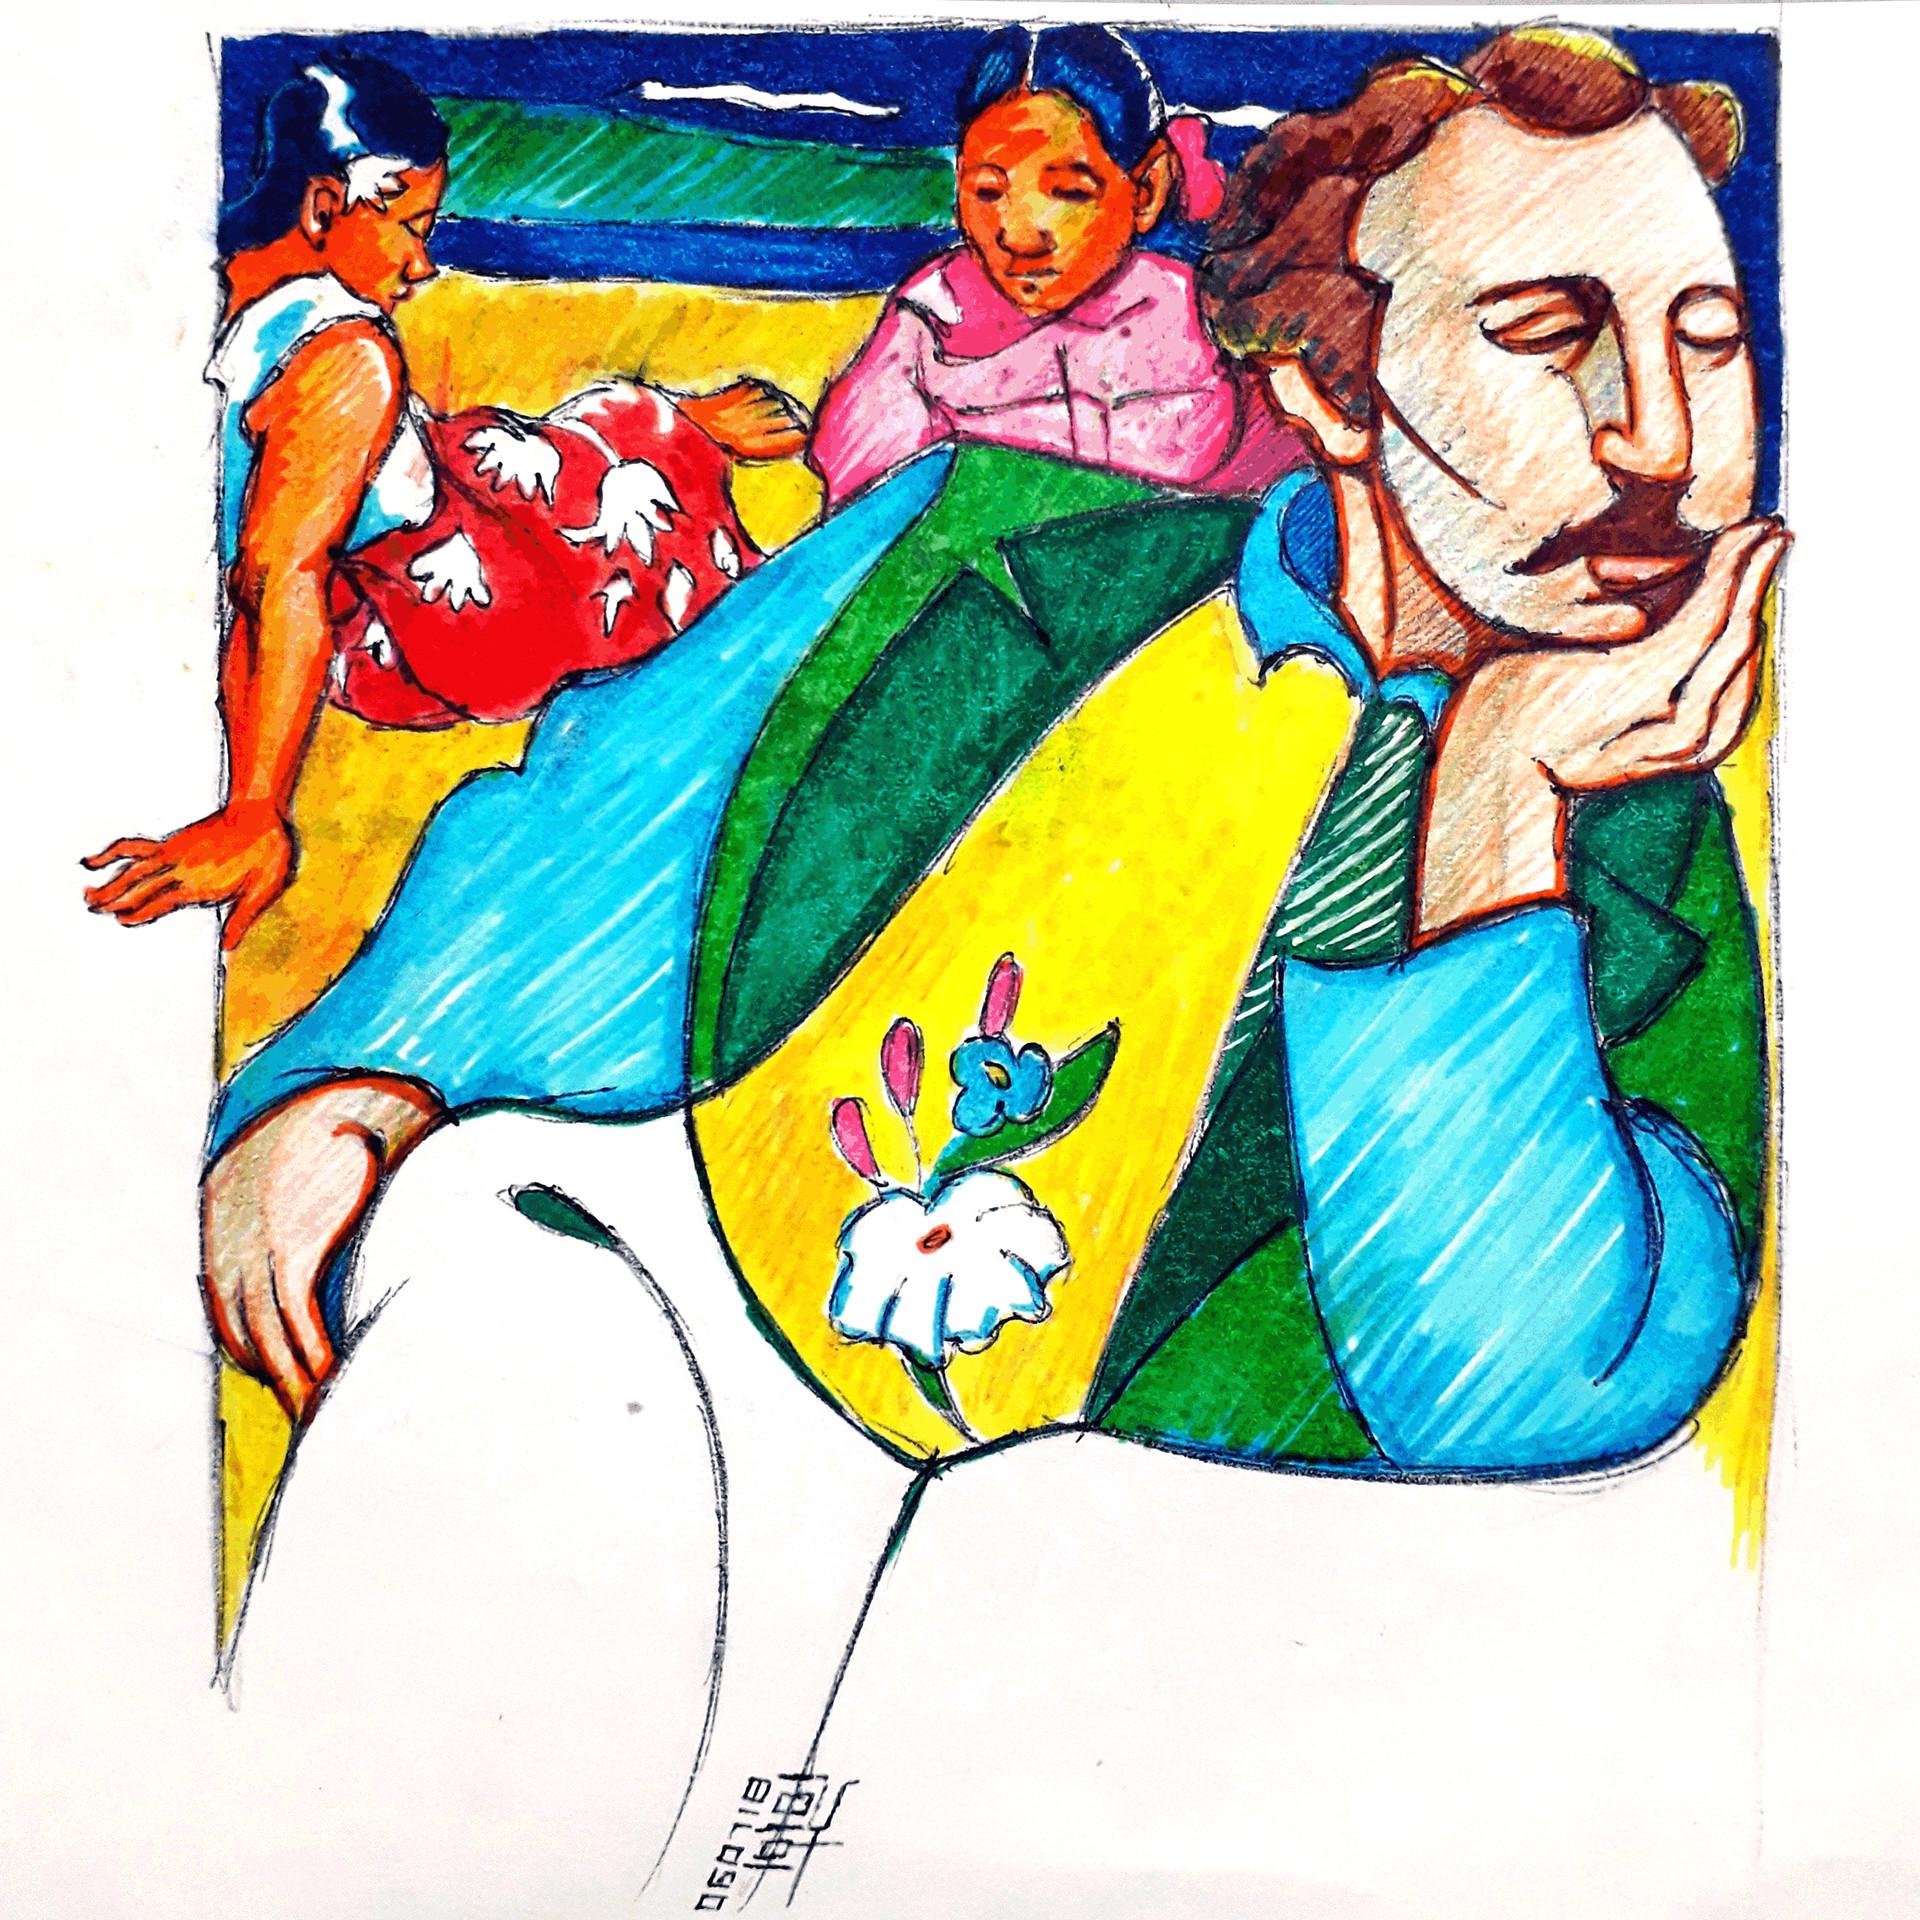 Day 06-07-18 - Gauguin